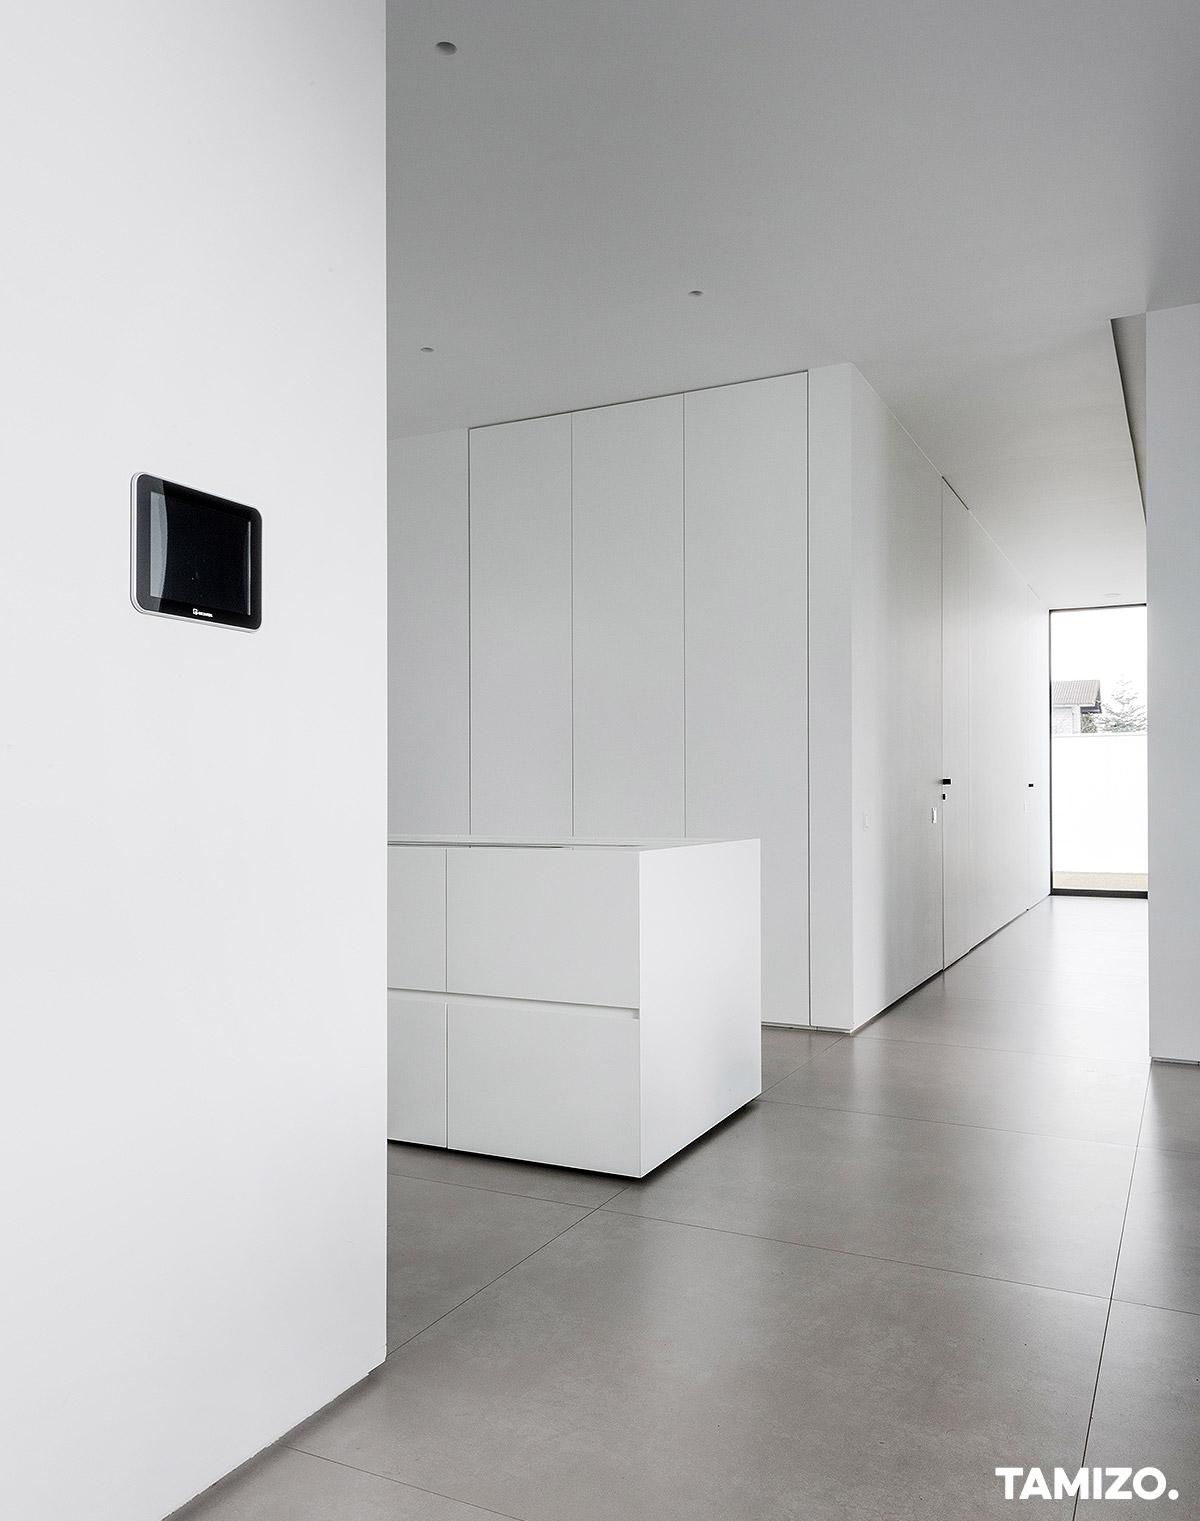 018_tamizo_architects_interior_house_realization_warsaw_poland_25